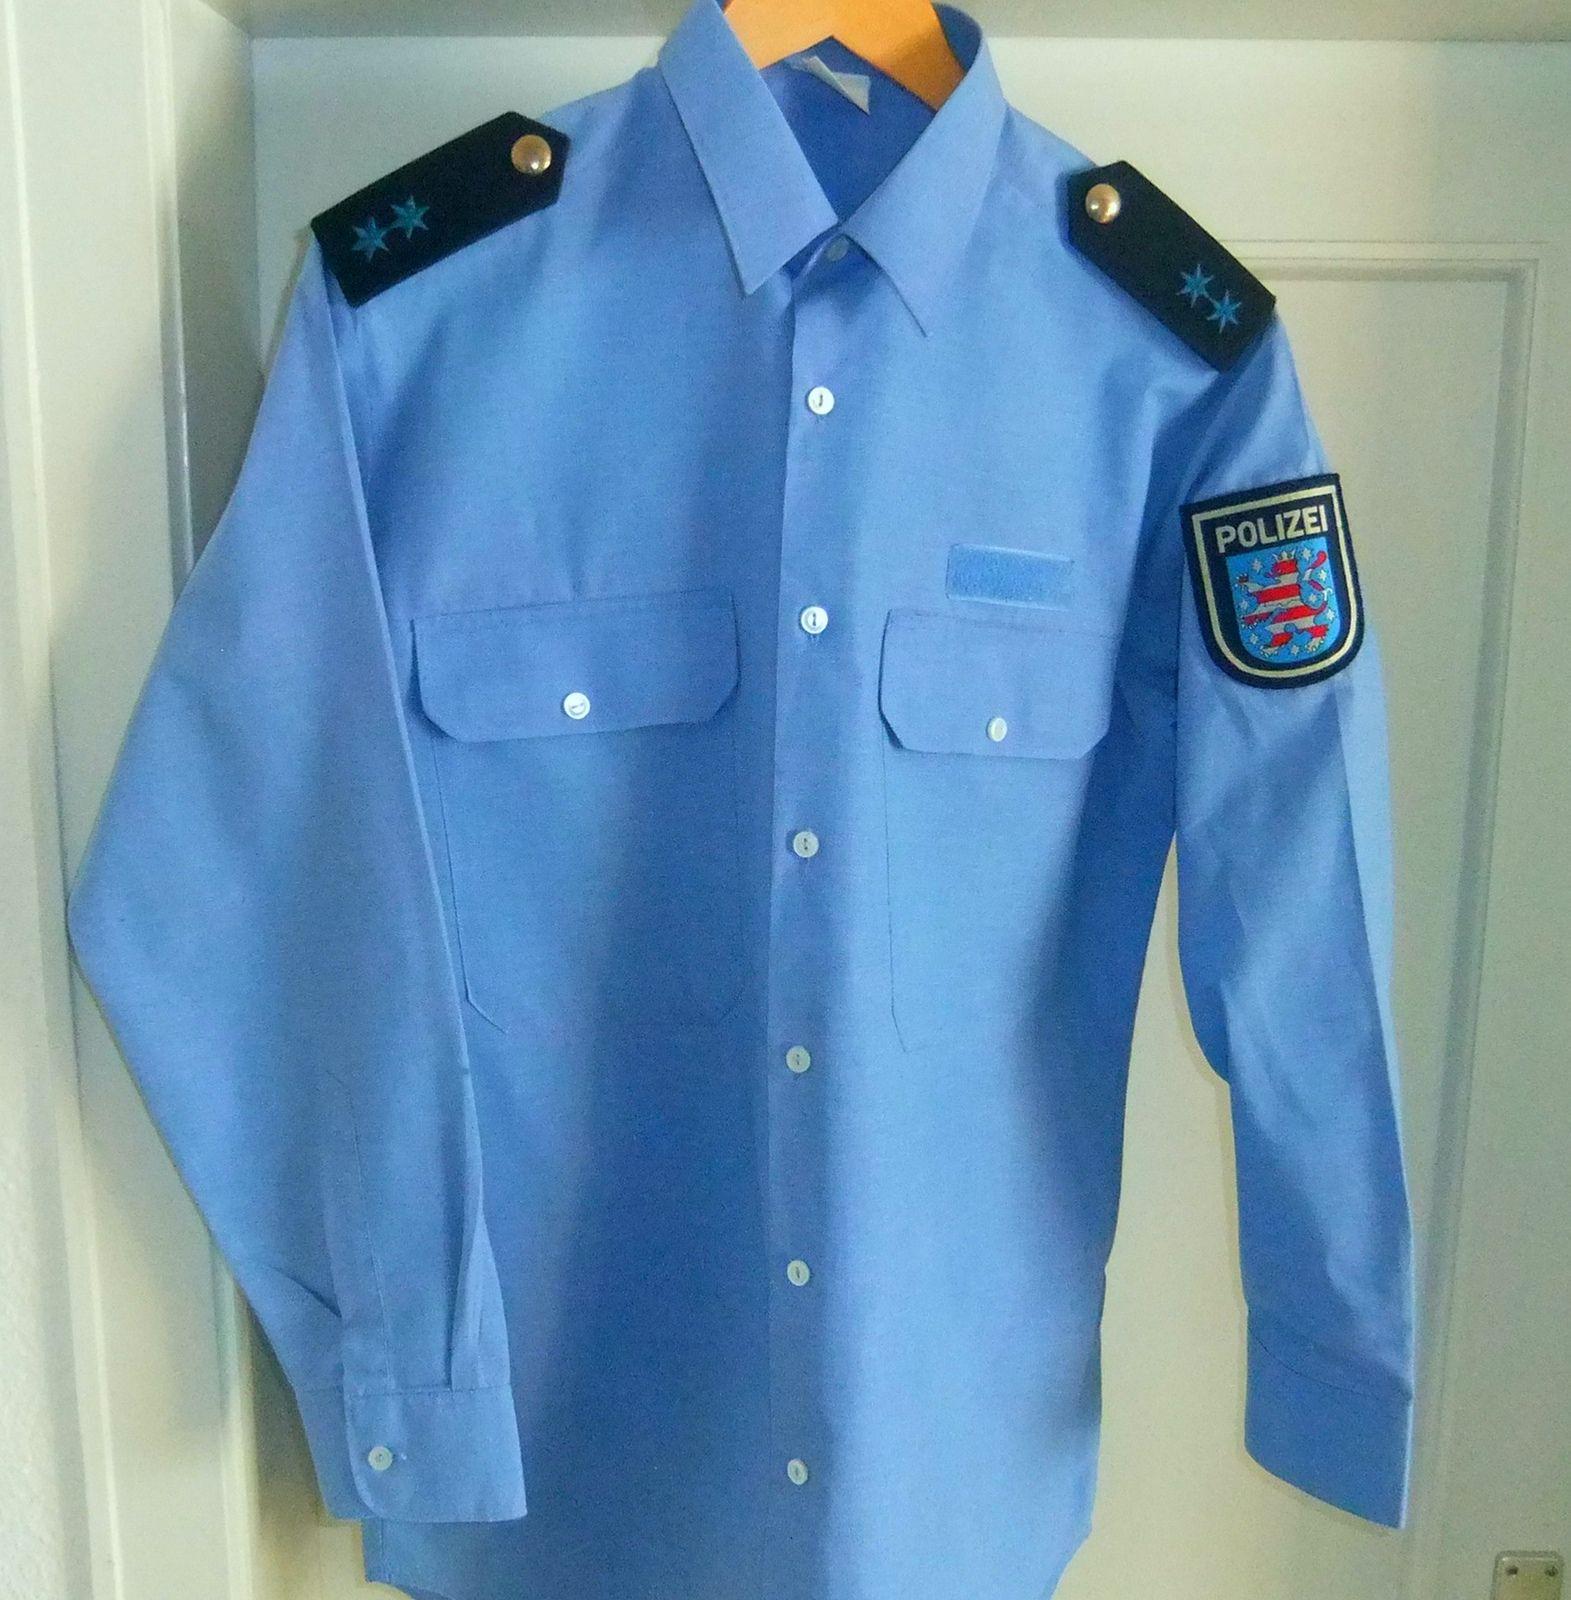 Dating-Polizeibeamte uk